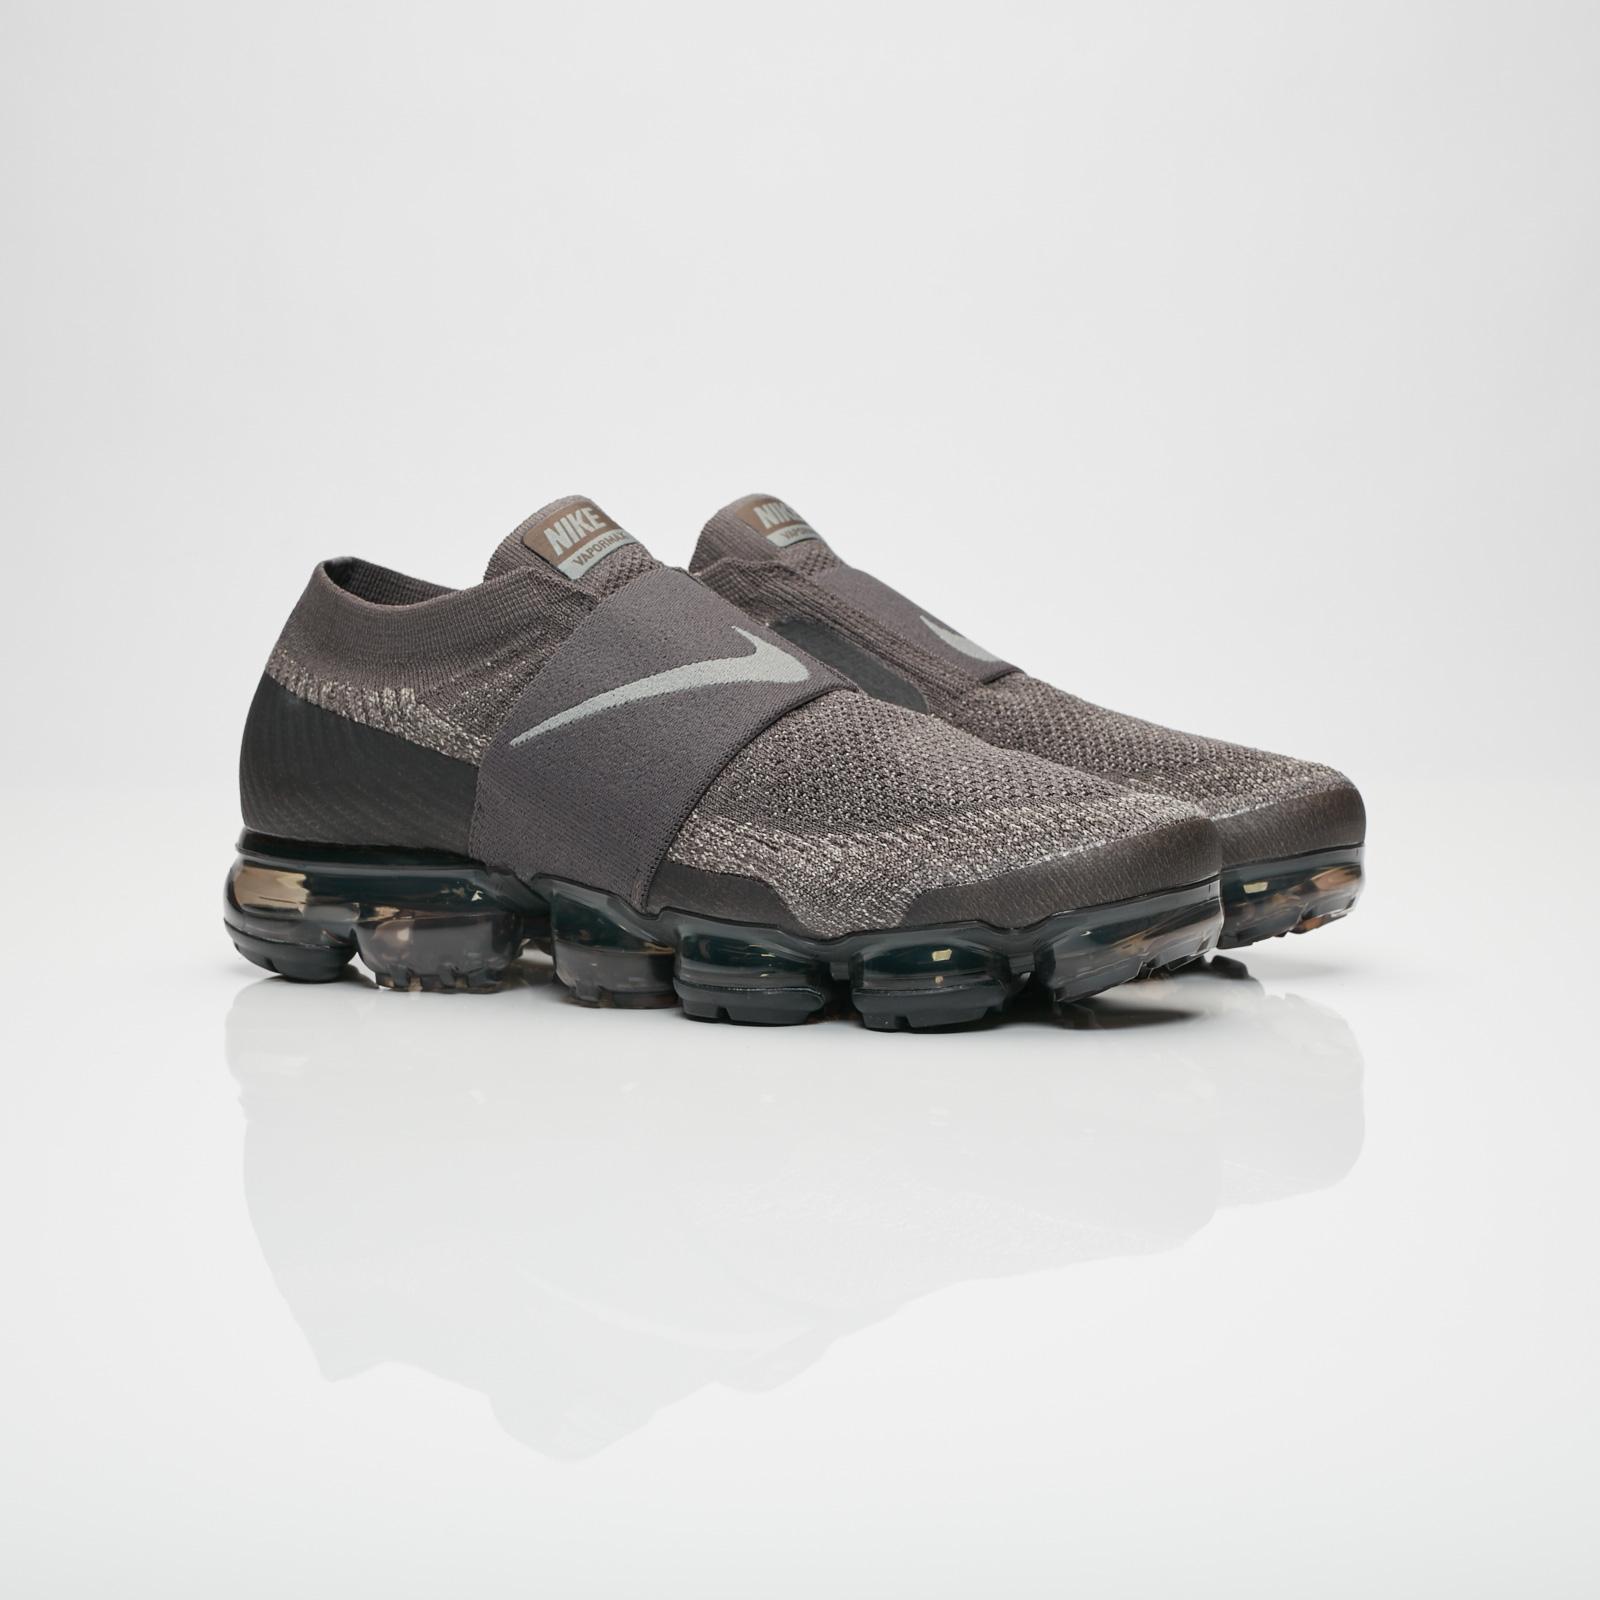 nike air vapormax flyknit moc ah3397 013 sneakersnstuff